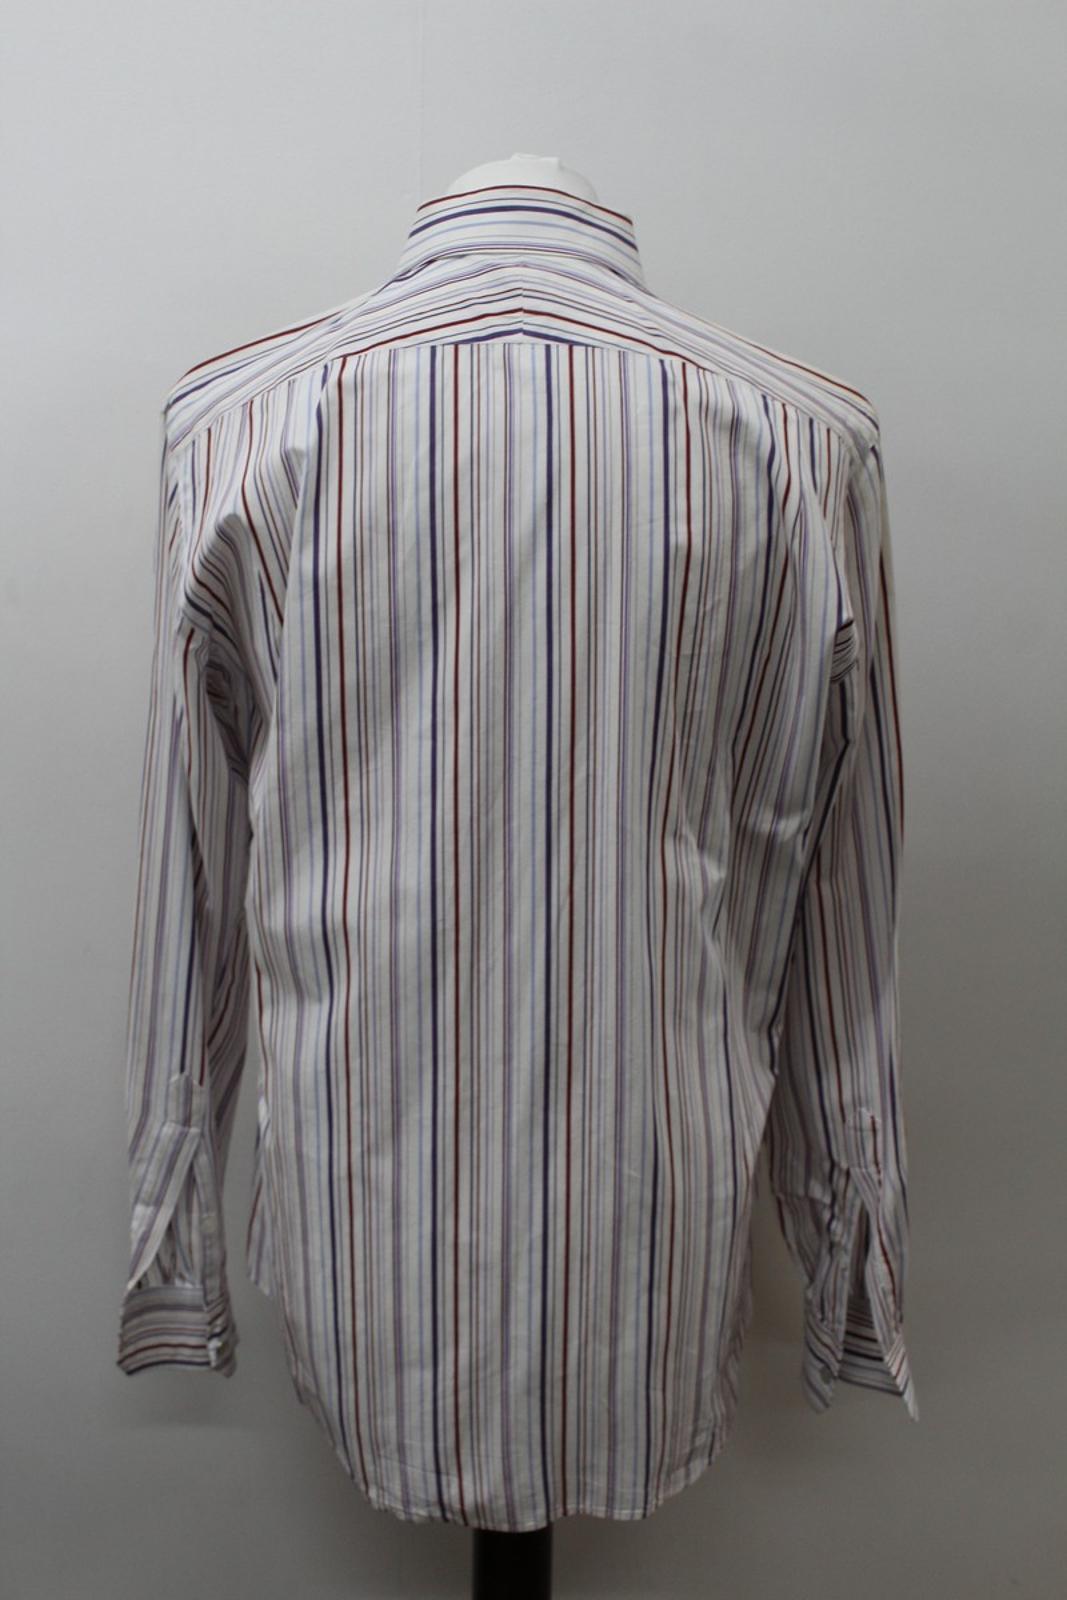 Hermes-para-hombre-Multi-Color-a-rayas-de-algodon-camisa-de-mangas-largas-cuello-16-5-034-42cm miniatura 5